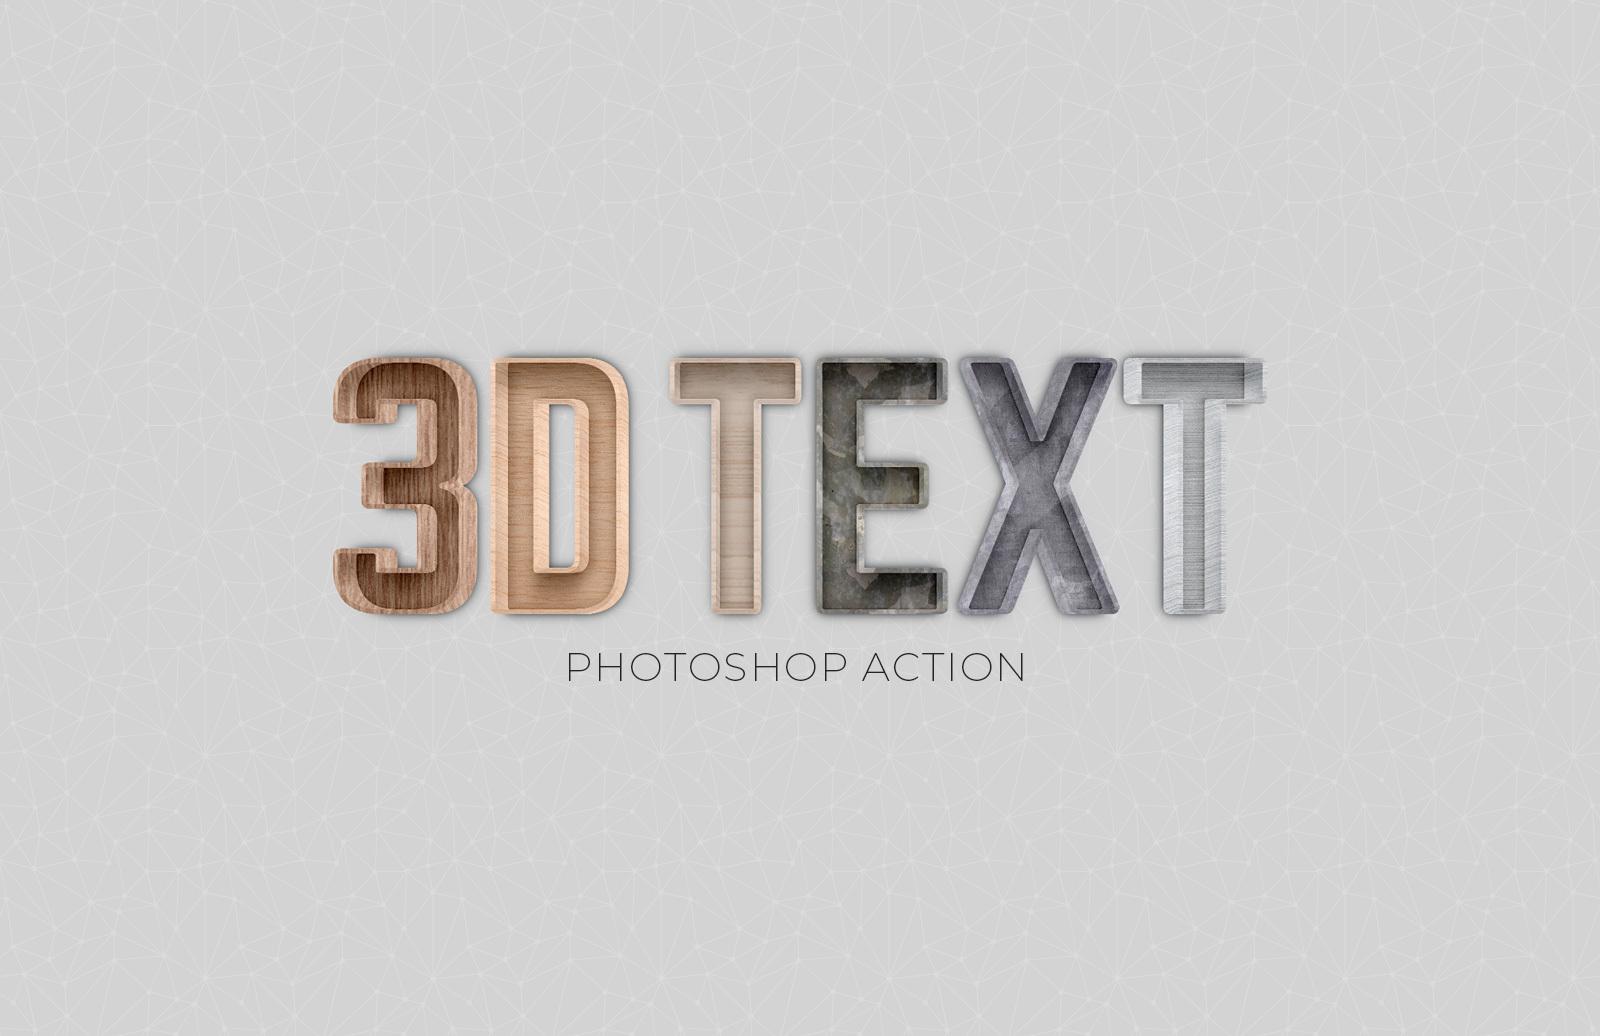 3 D Text Photoshop Action Preview 1